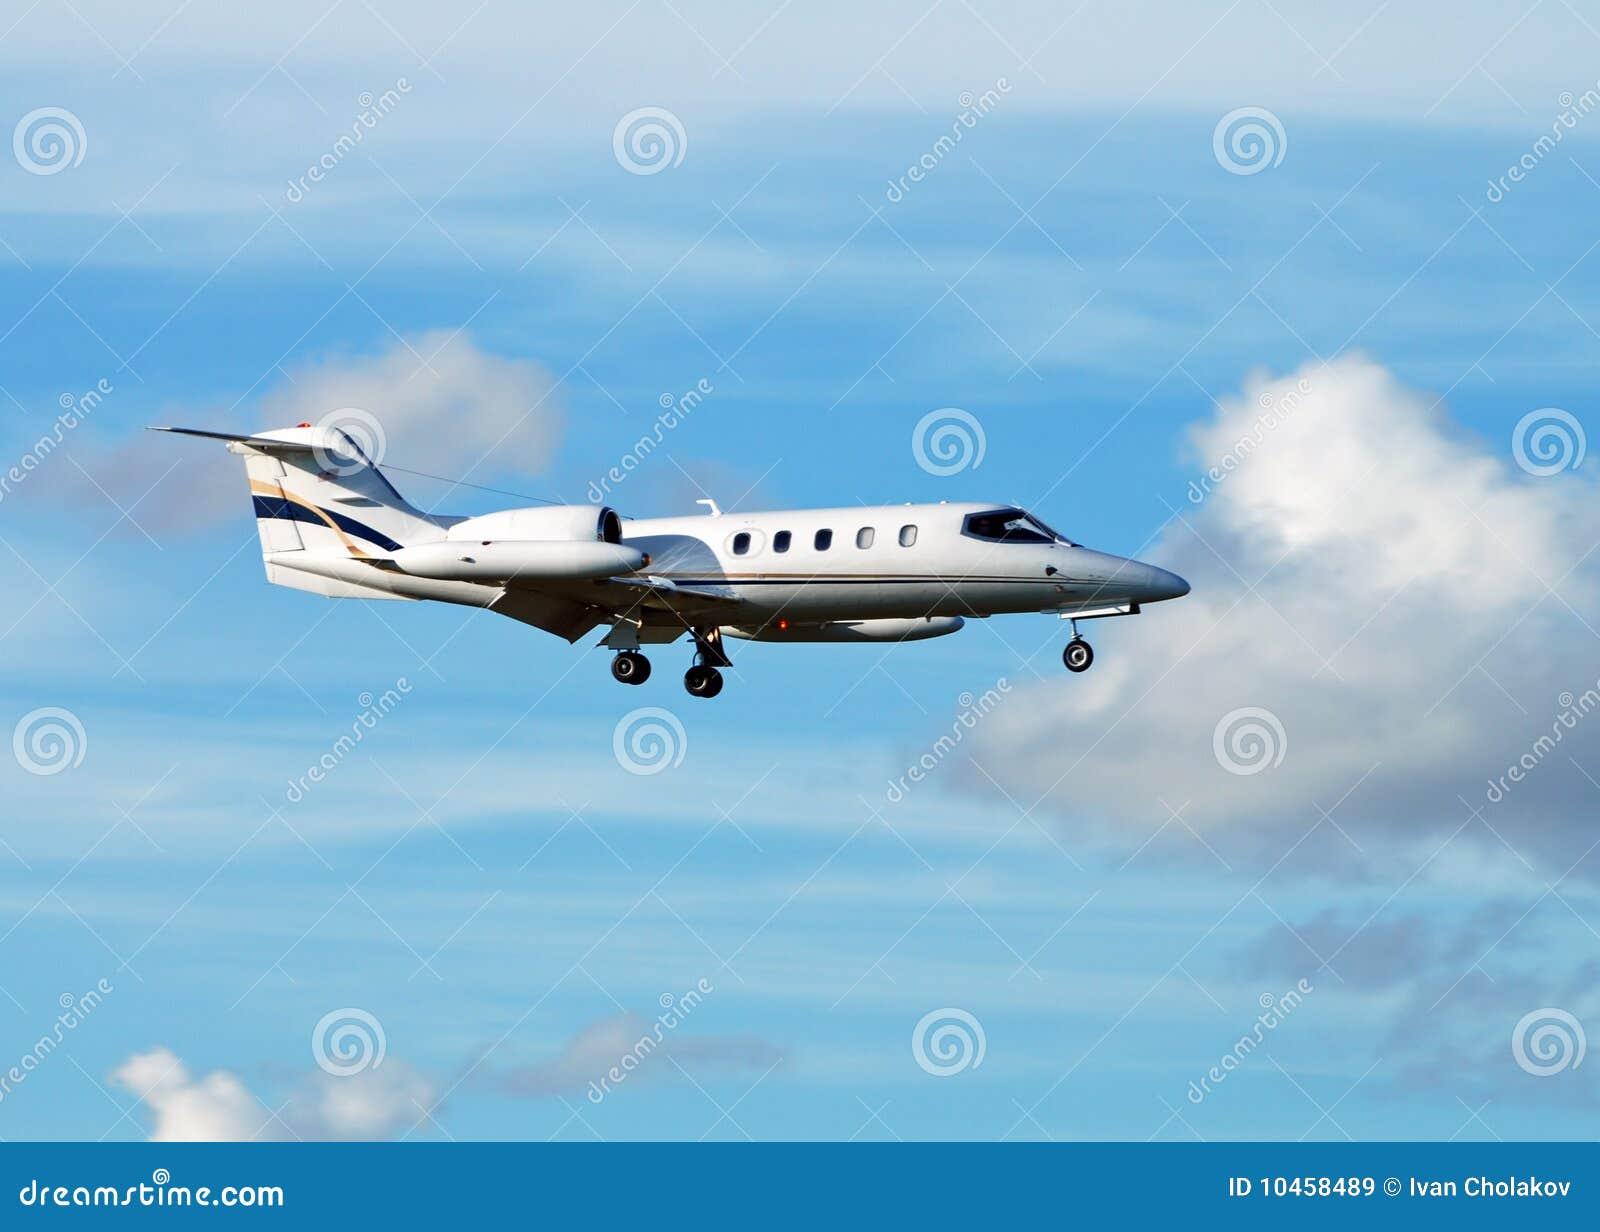 Business jet airplane